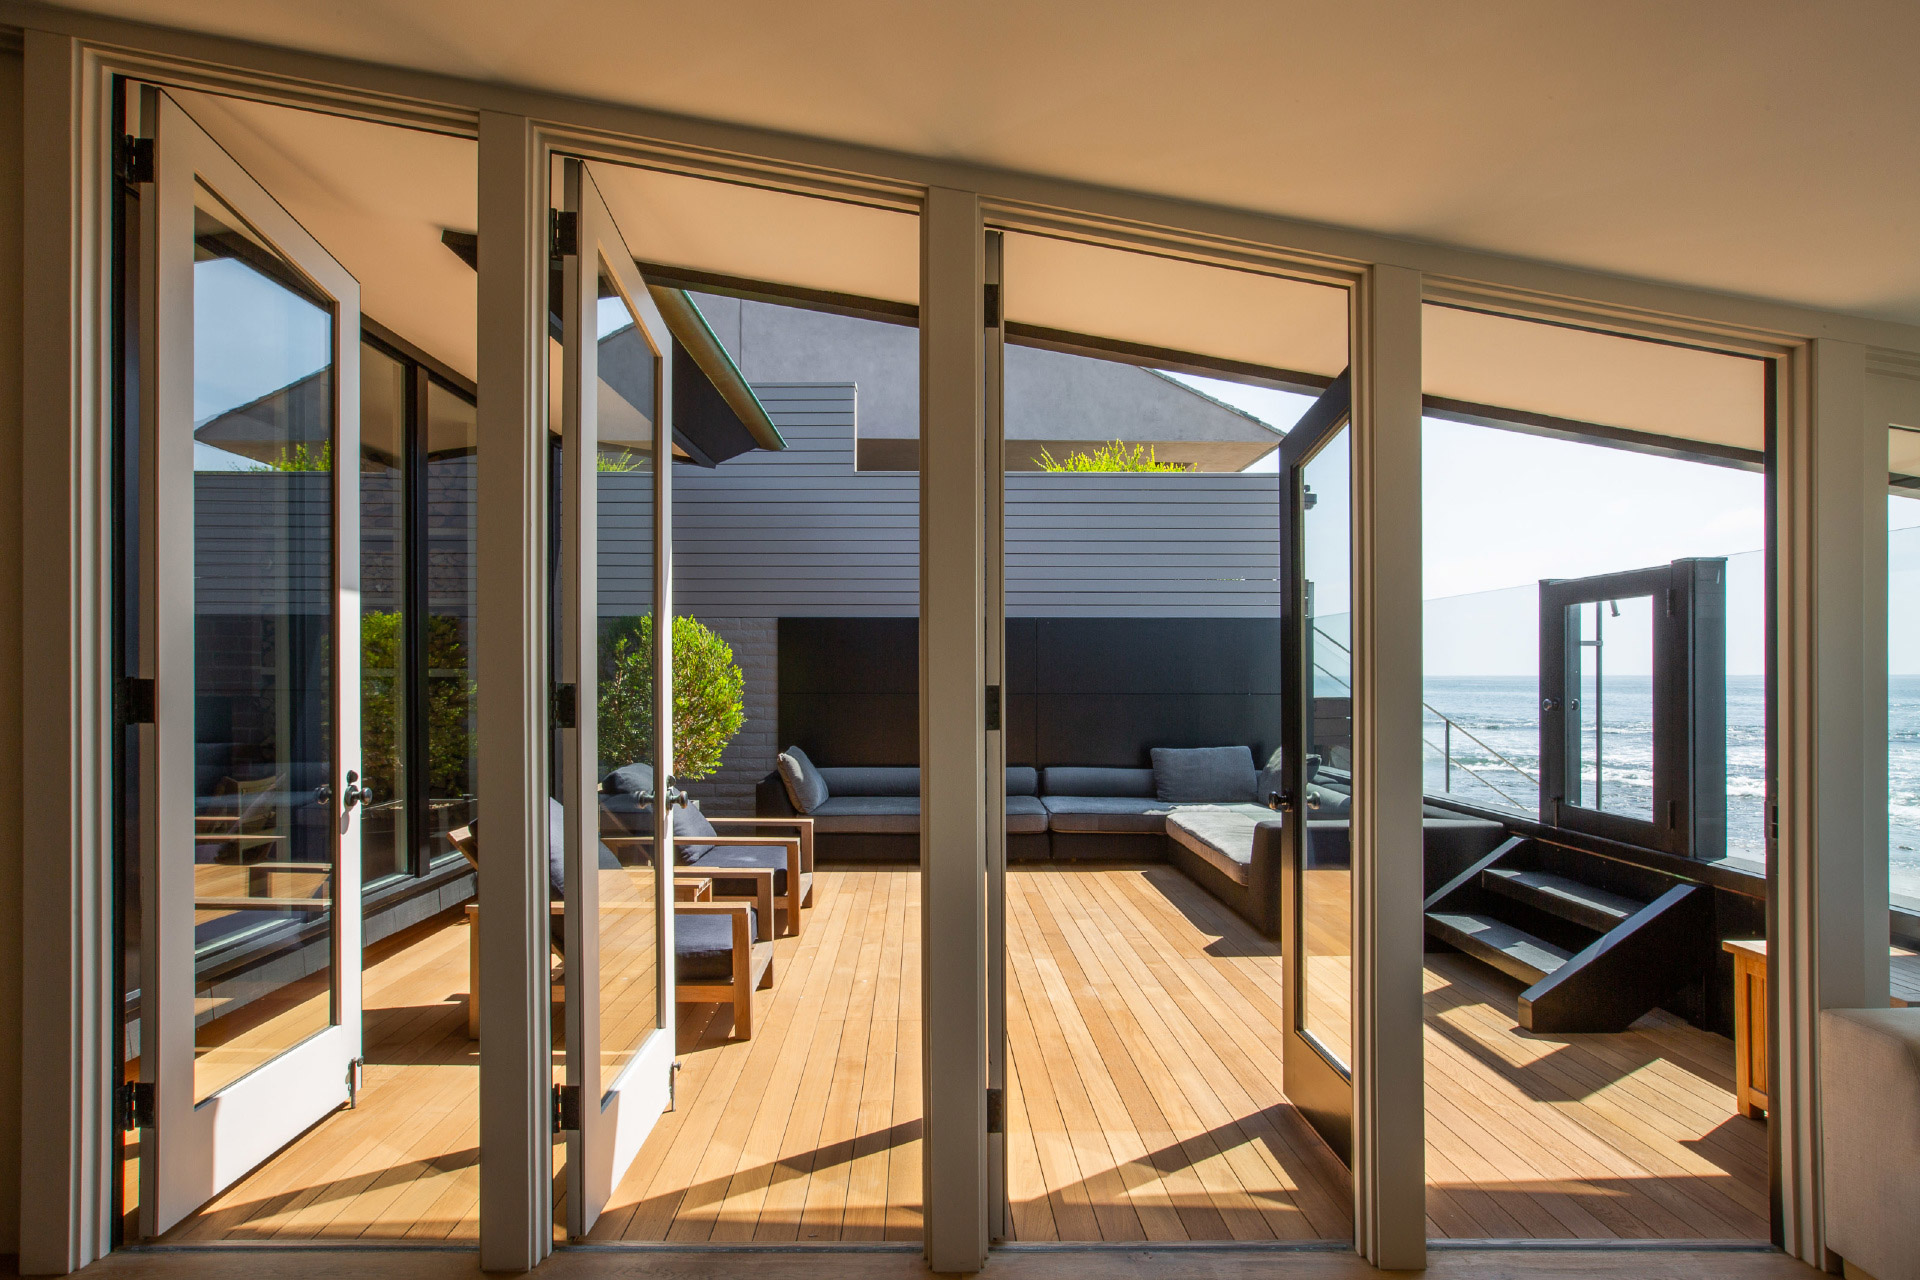 Ein Blick in Jason Stathams Strandhaus in Malibu, Kalifornien 3